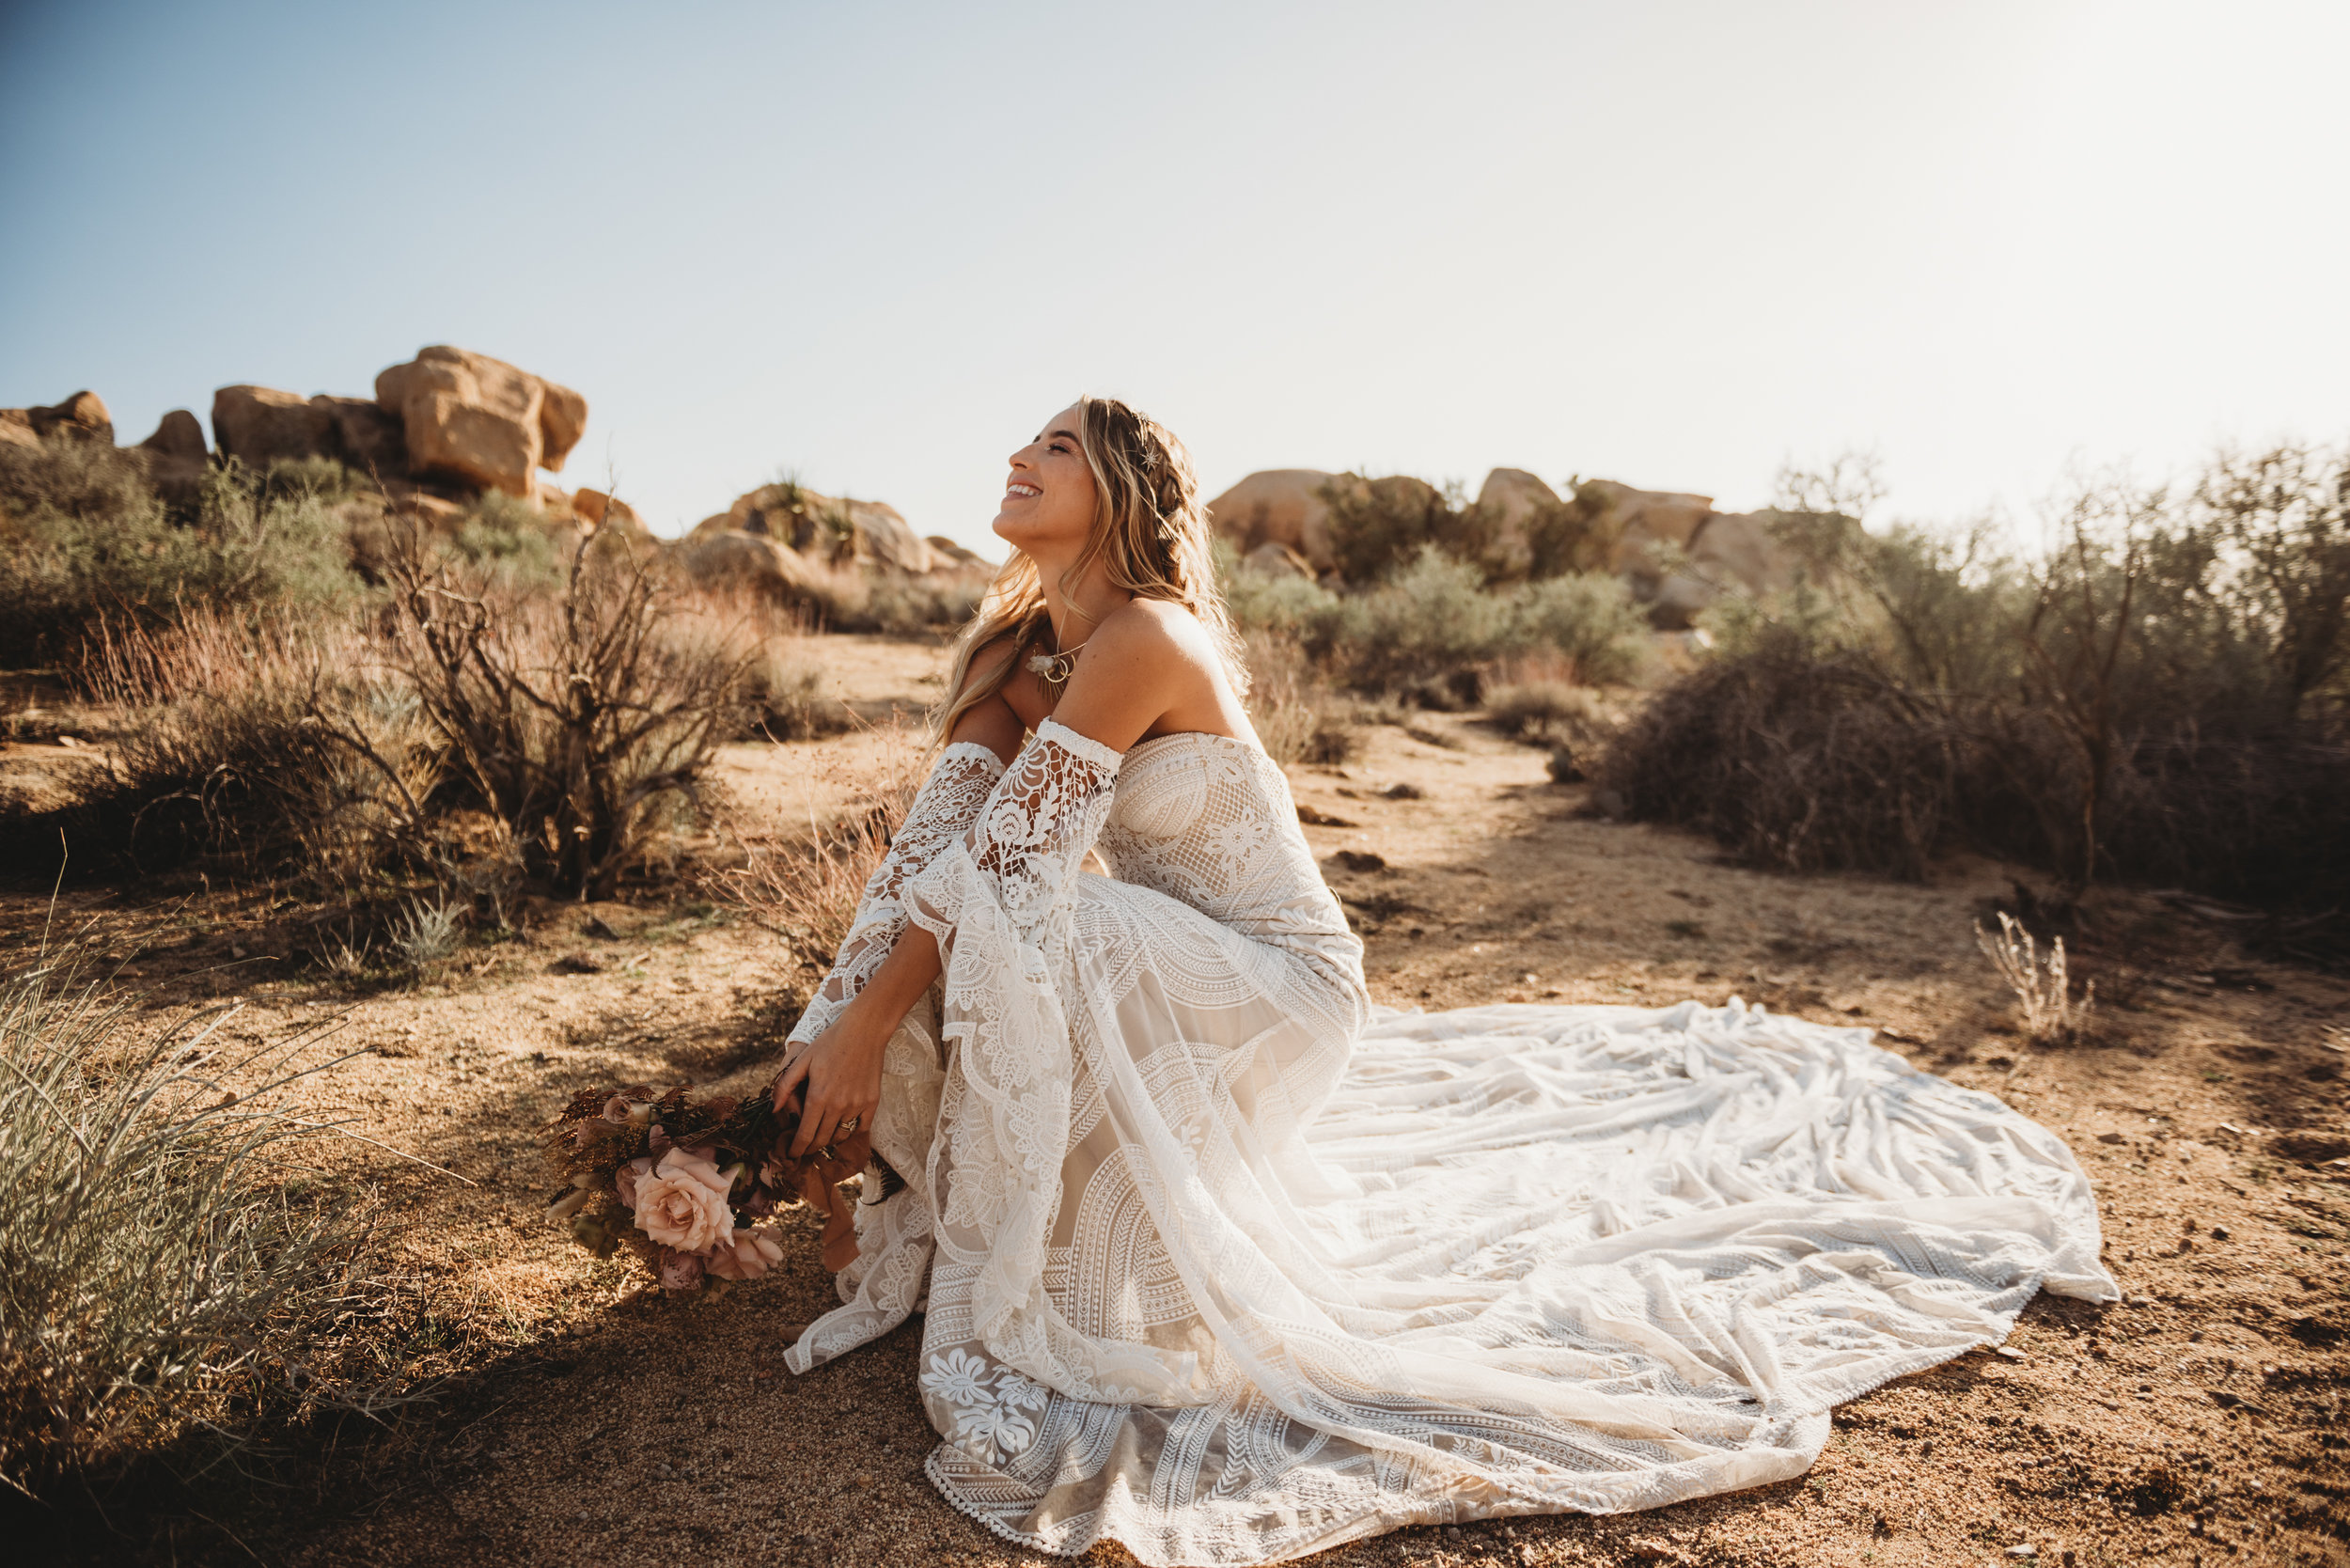 FortSt.John_photographer_TyraEPhotography_Wedding_Couple_Family_Photograhy_DawsonCreek_Elopement_Bride_Boduoir_Portraits-4995.jpg